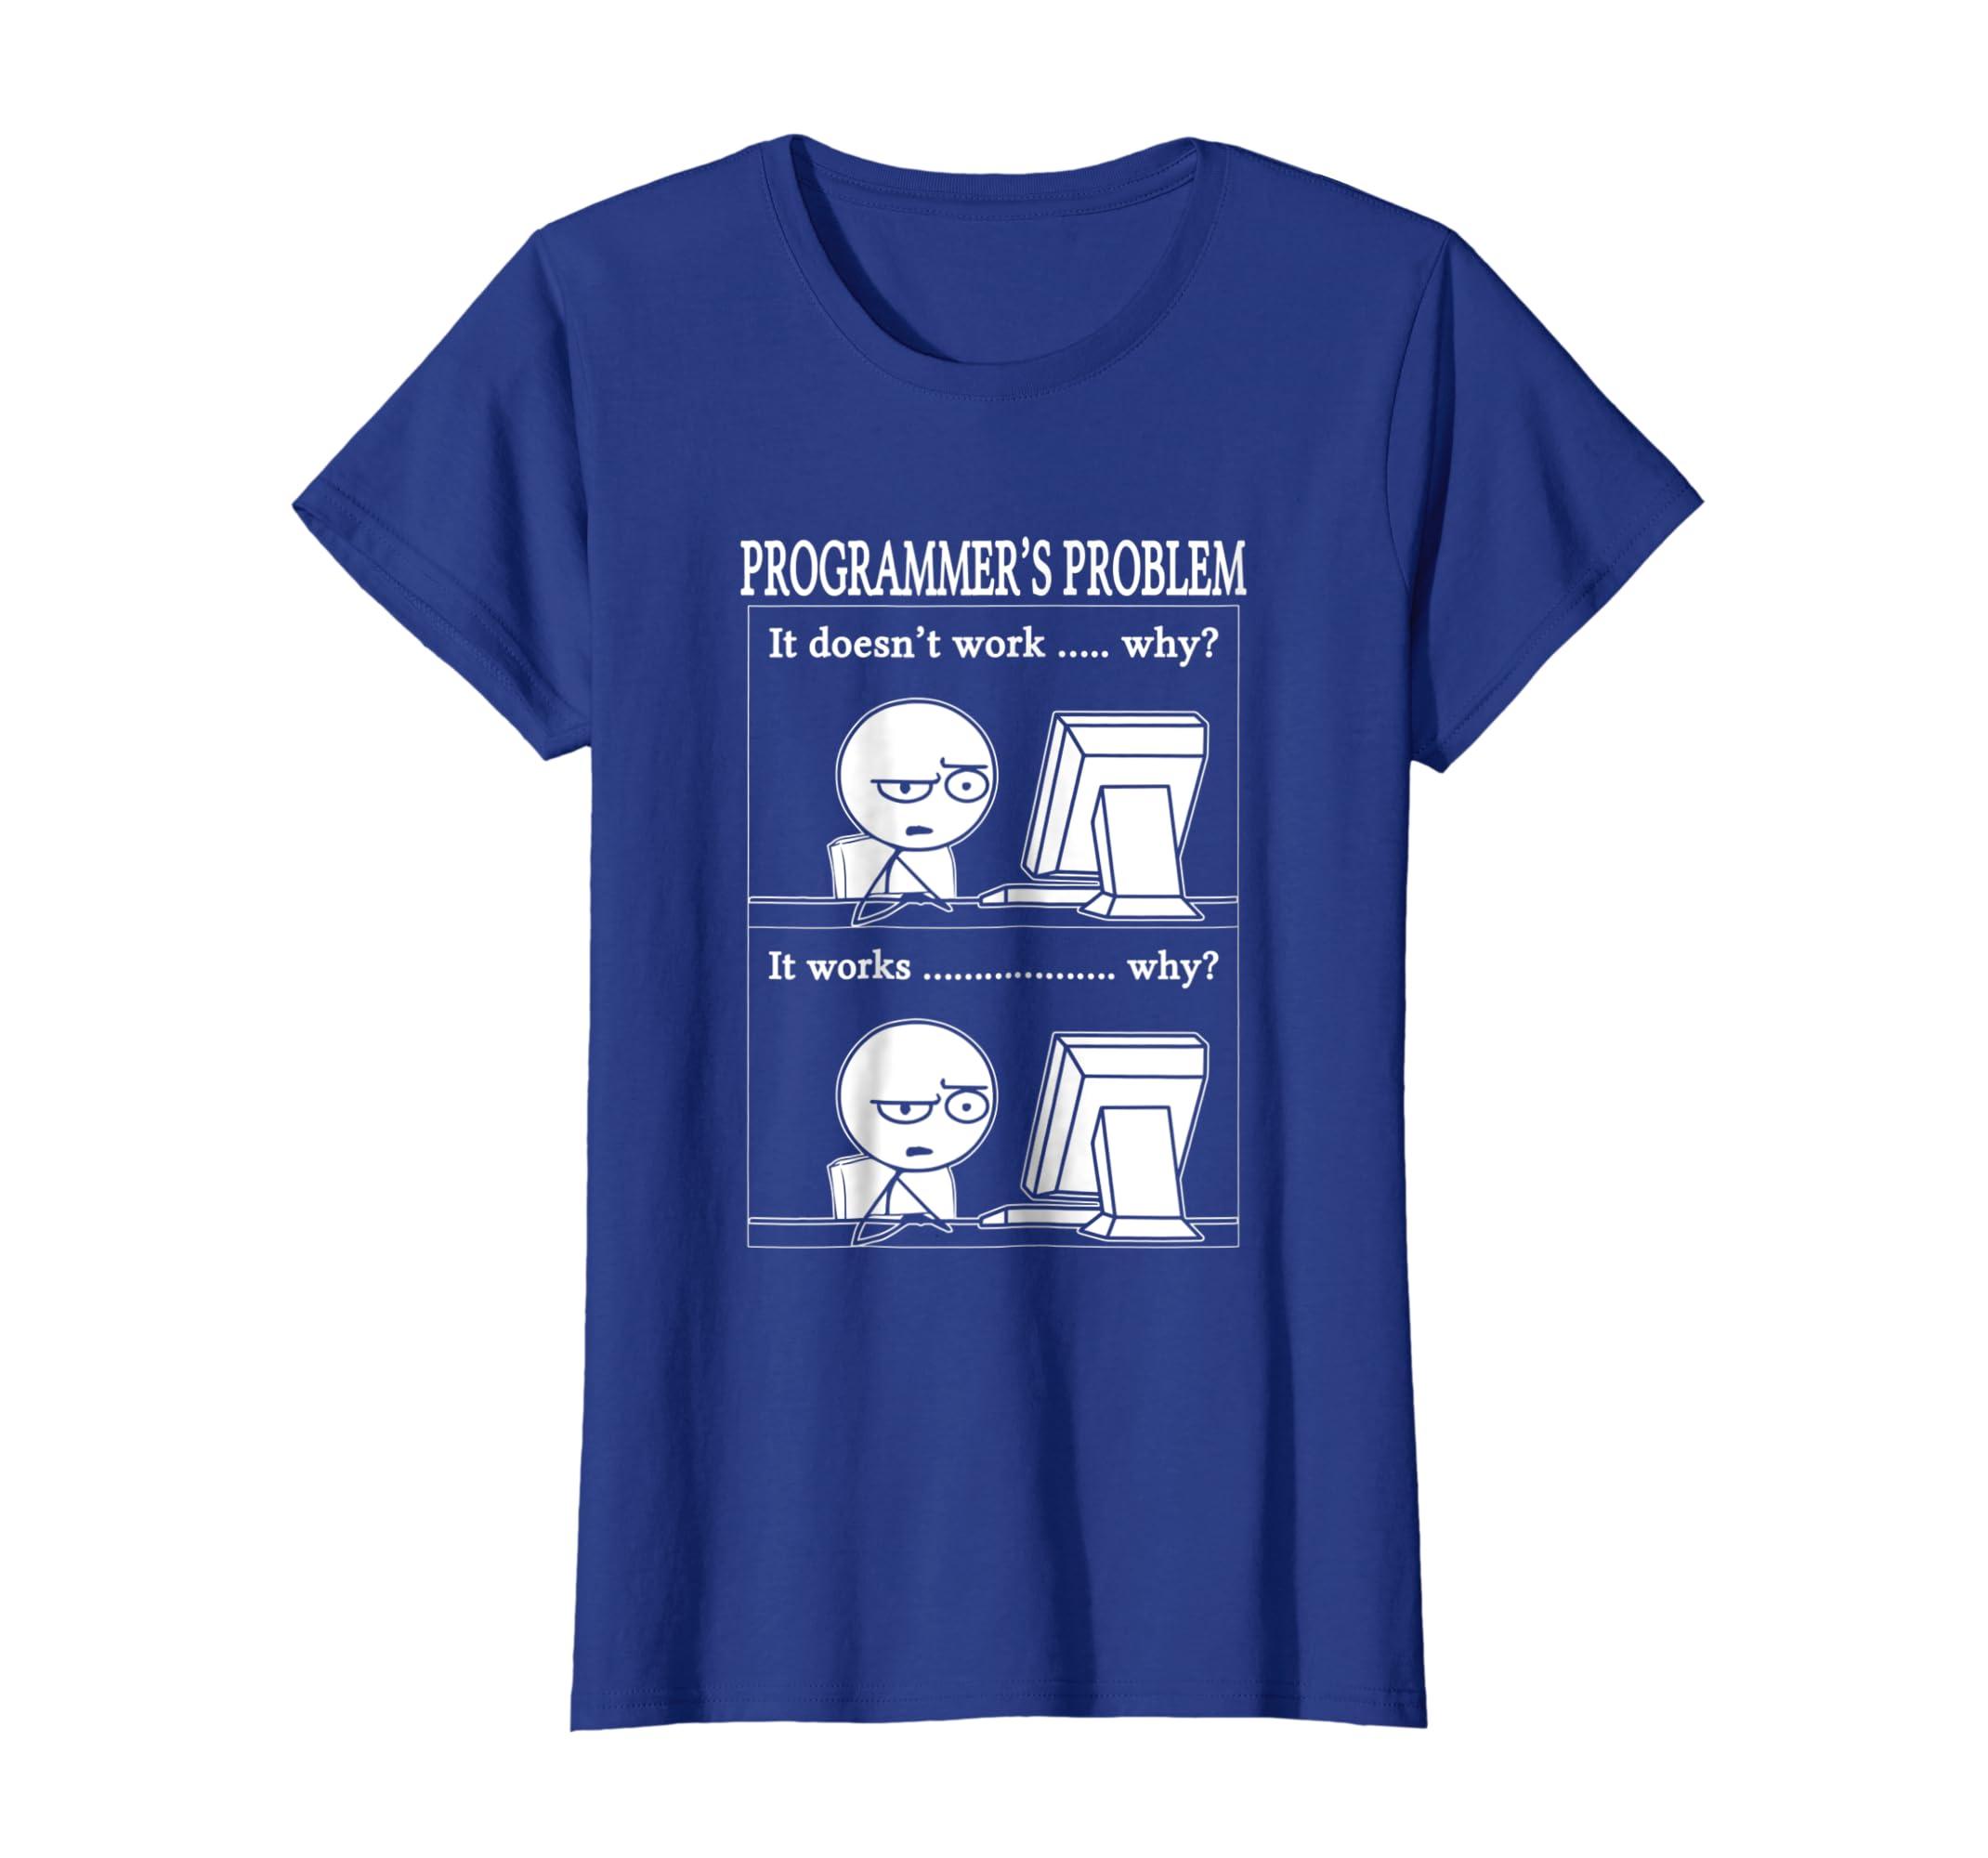 f9cee084 Amazon.com: Funny Programmers Problem TShirt Fun Developer Gift Shirt:  Clothing